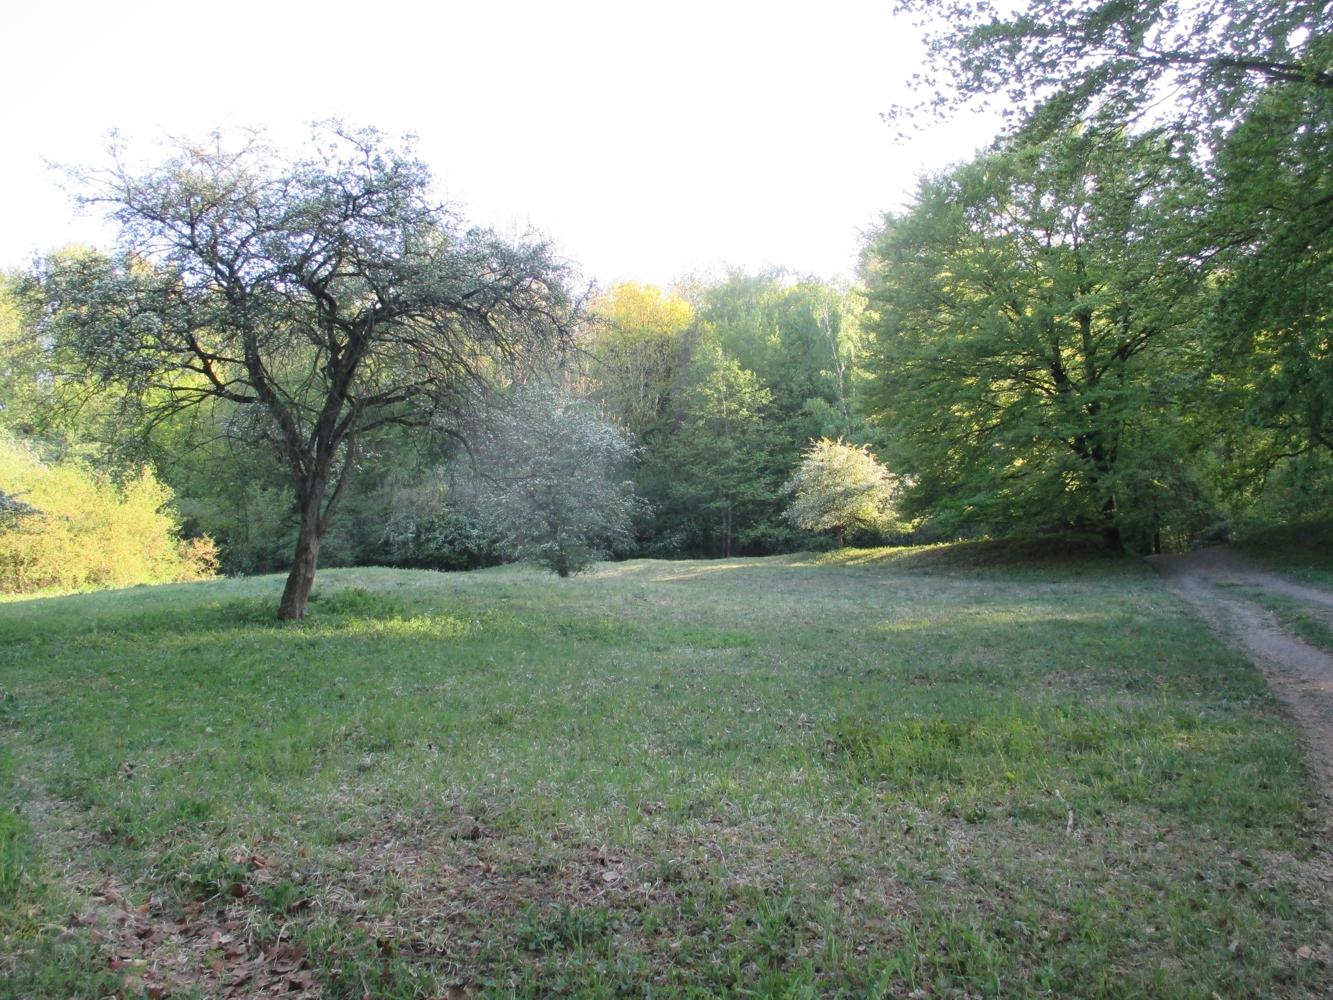 VNU - Naturschutzgebiet Mackenberg - Gabriele Deppe - 26.04.2020